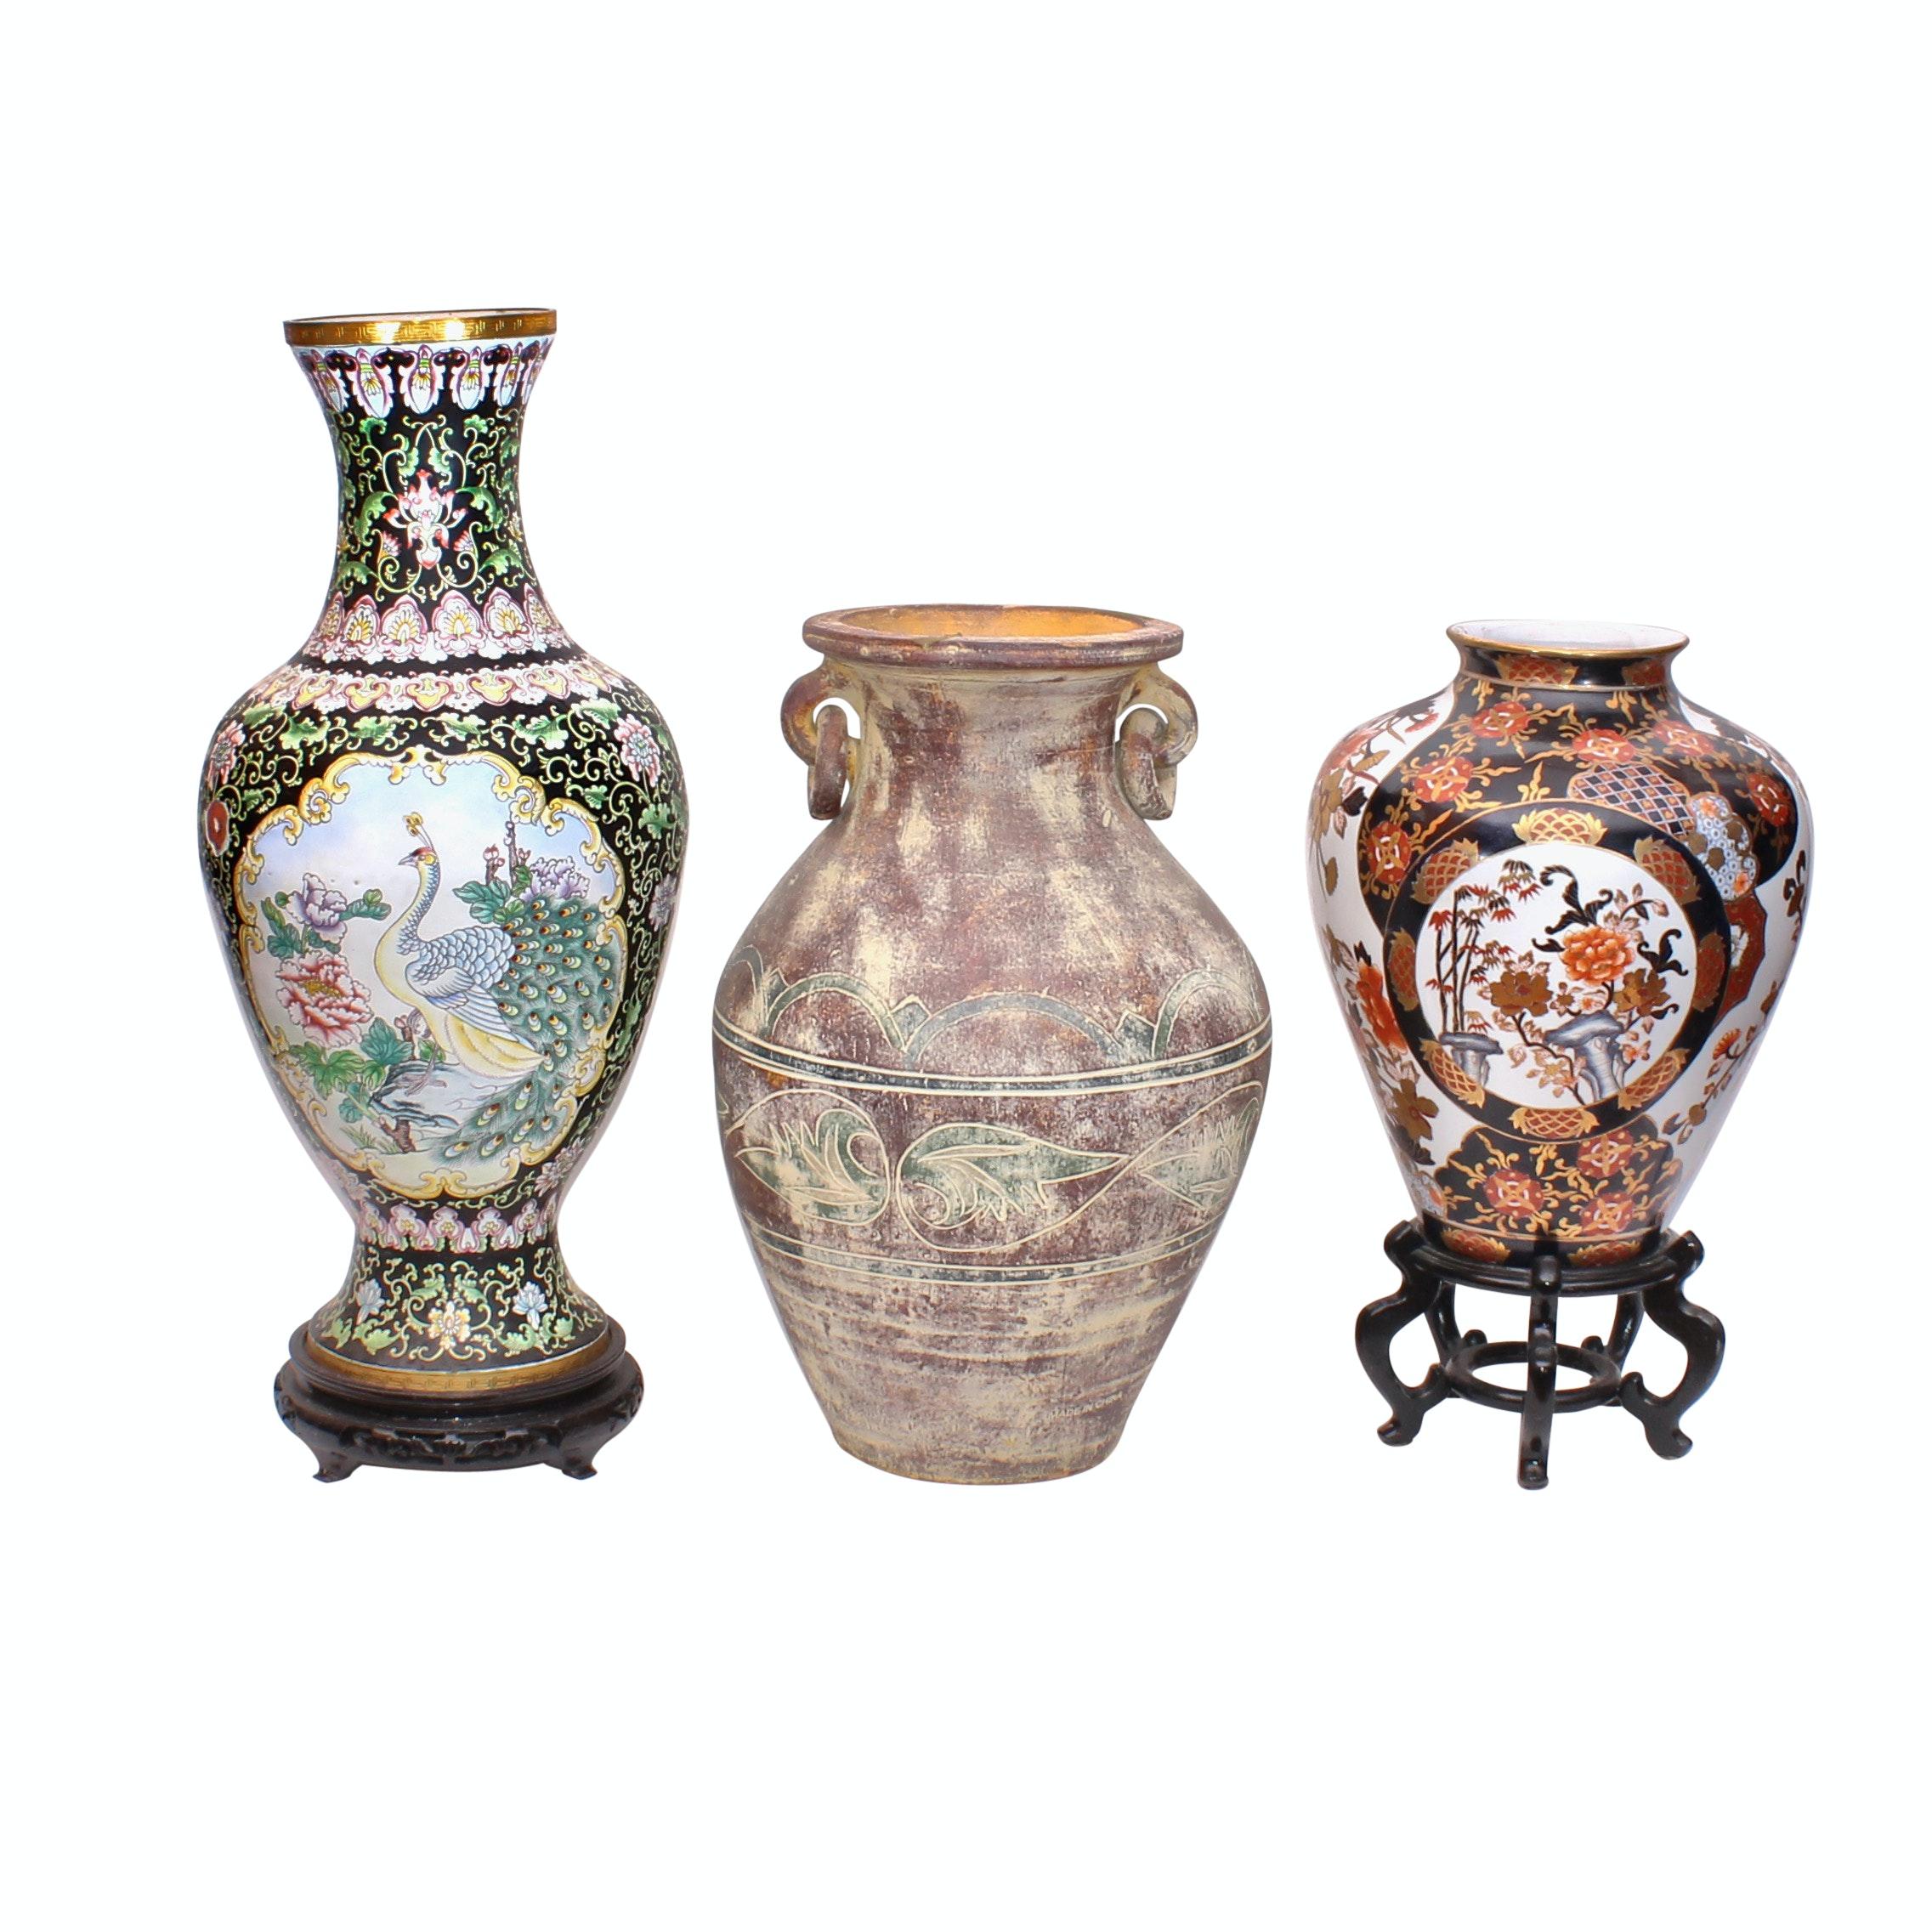 Decorative Floor Vase Selection